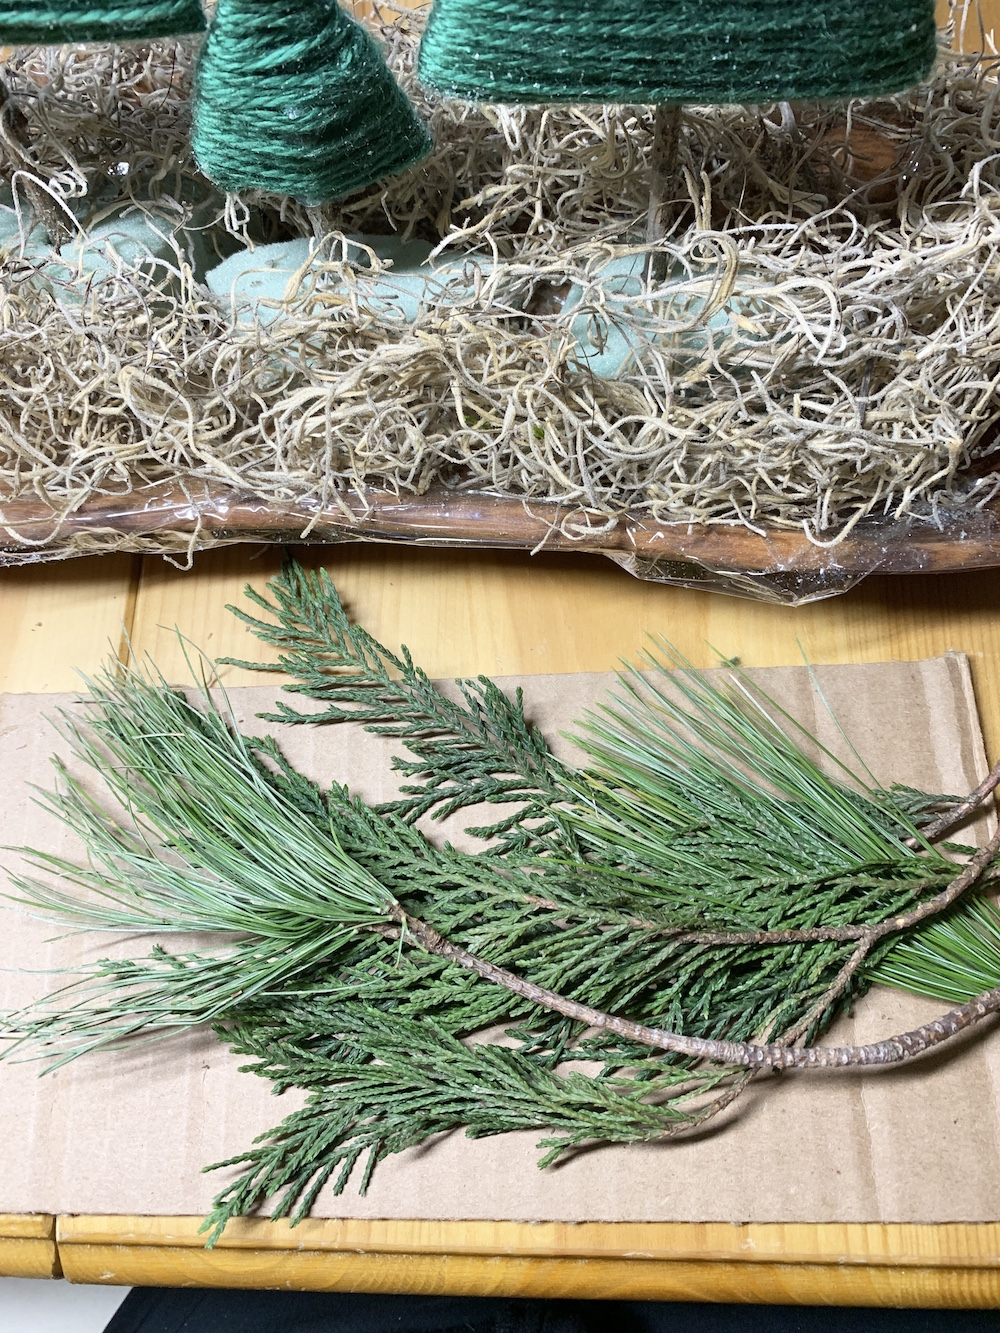 DIY Decor Greenery for Centerpiece #DIY #DIYChristmasCenterpiece #ChristmasDecor #ChristmasTableTop #DIYChristmasProject #RusticDecor #ChristmasCenterpiece